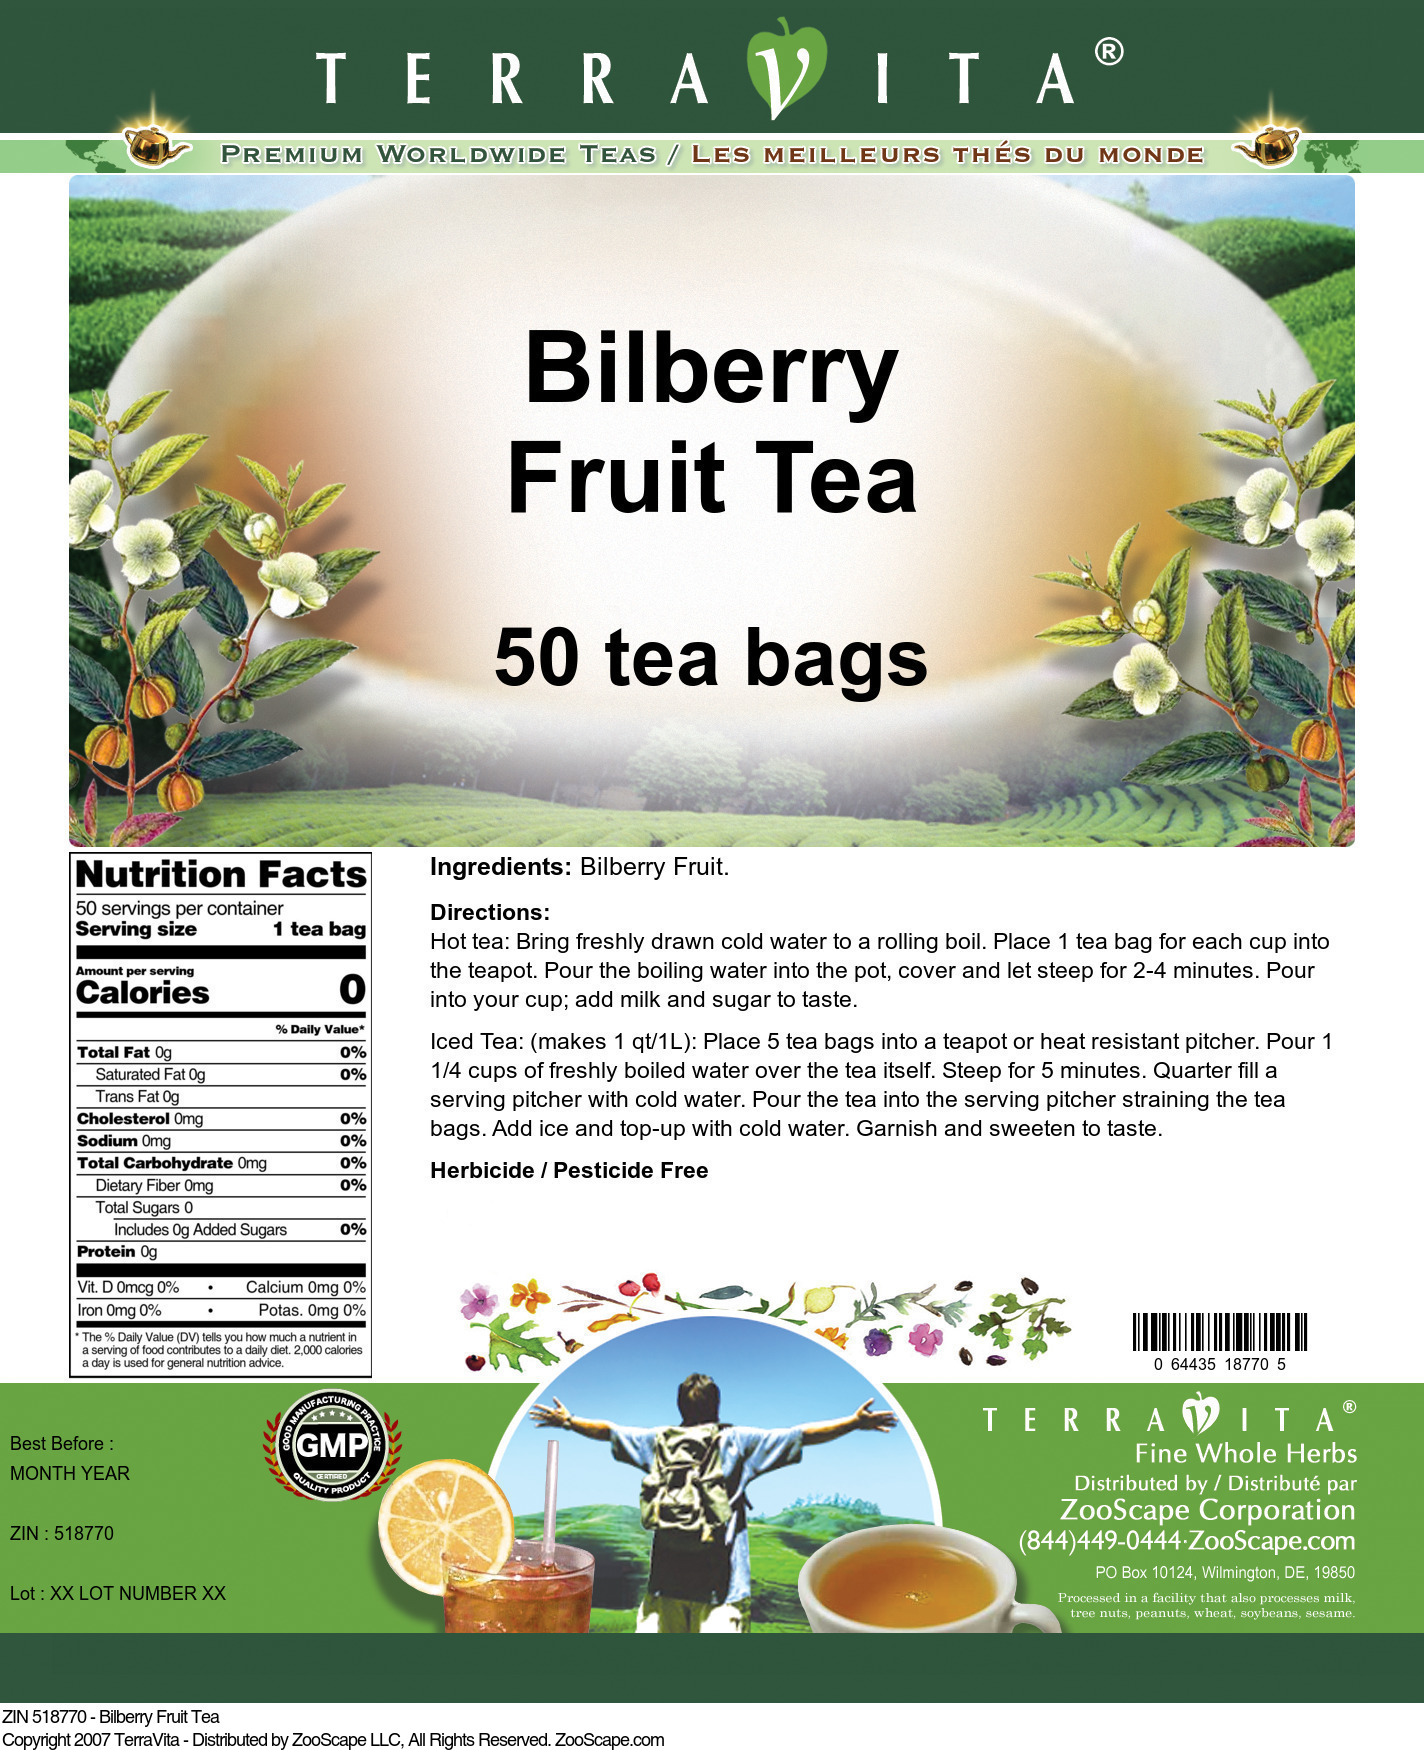 Bilberry Fruit Tea